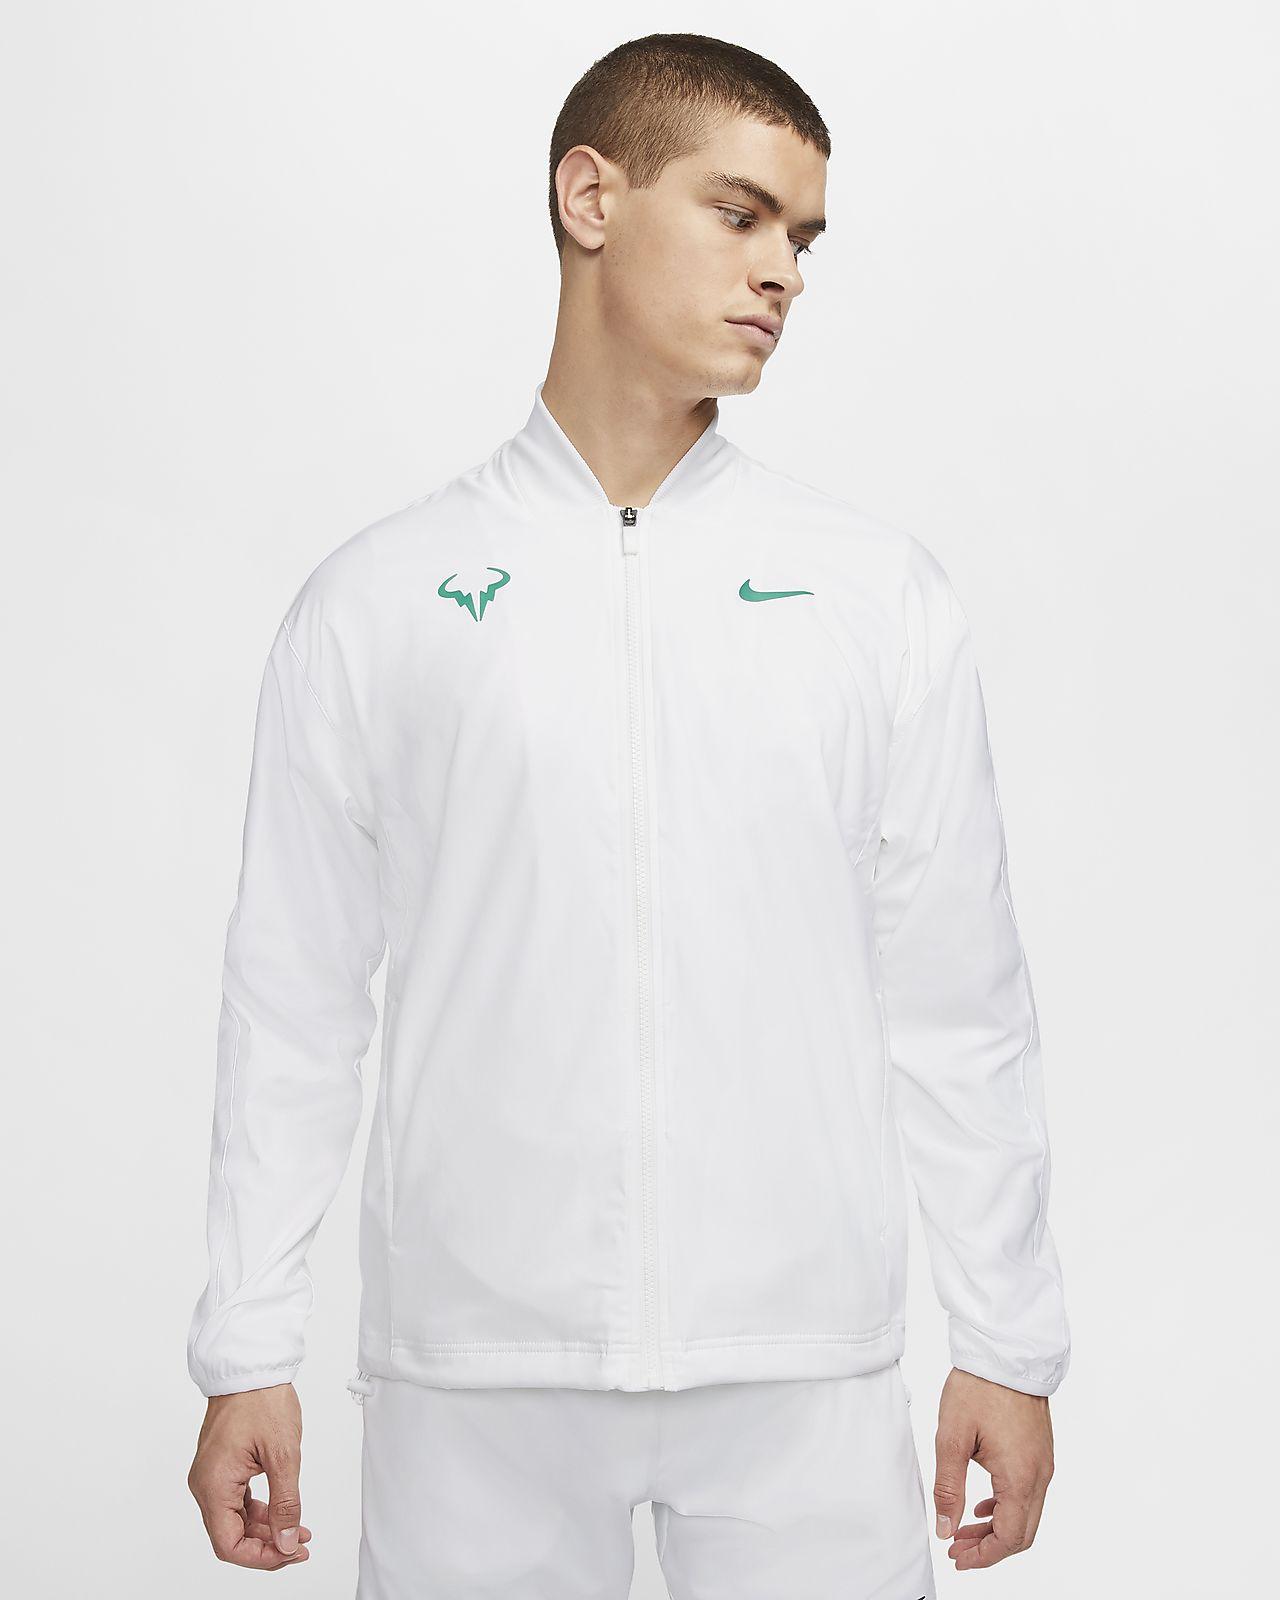 Rafa Chaqueta de tenis - Hombre